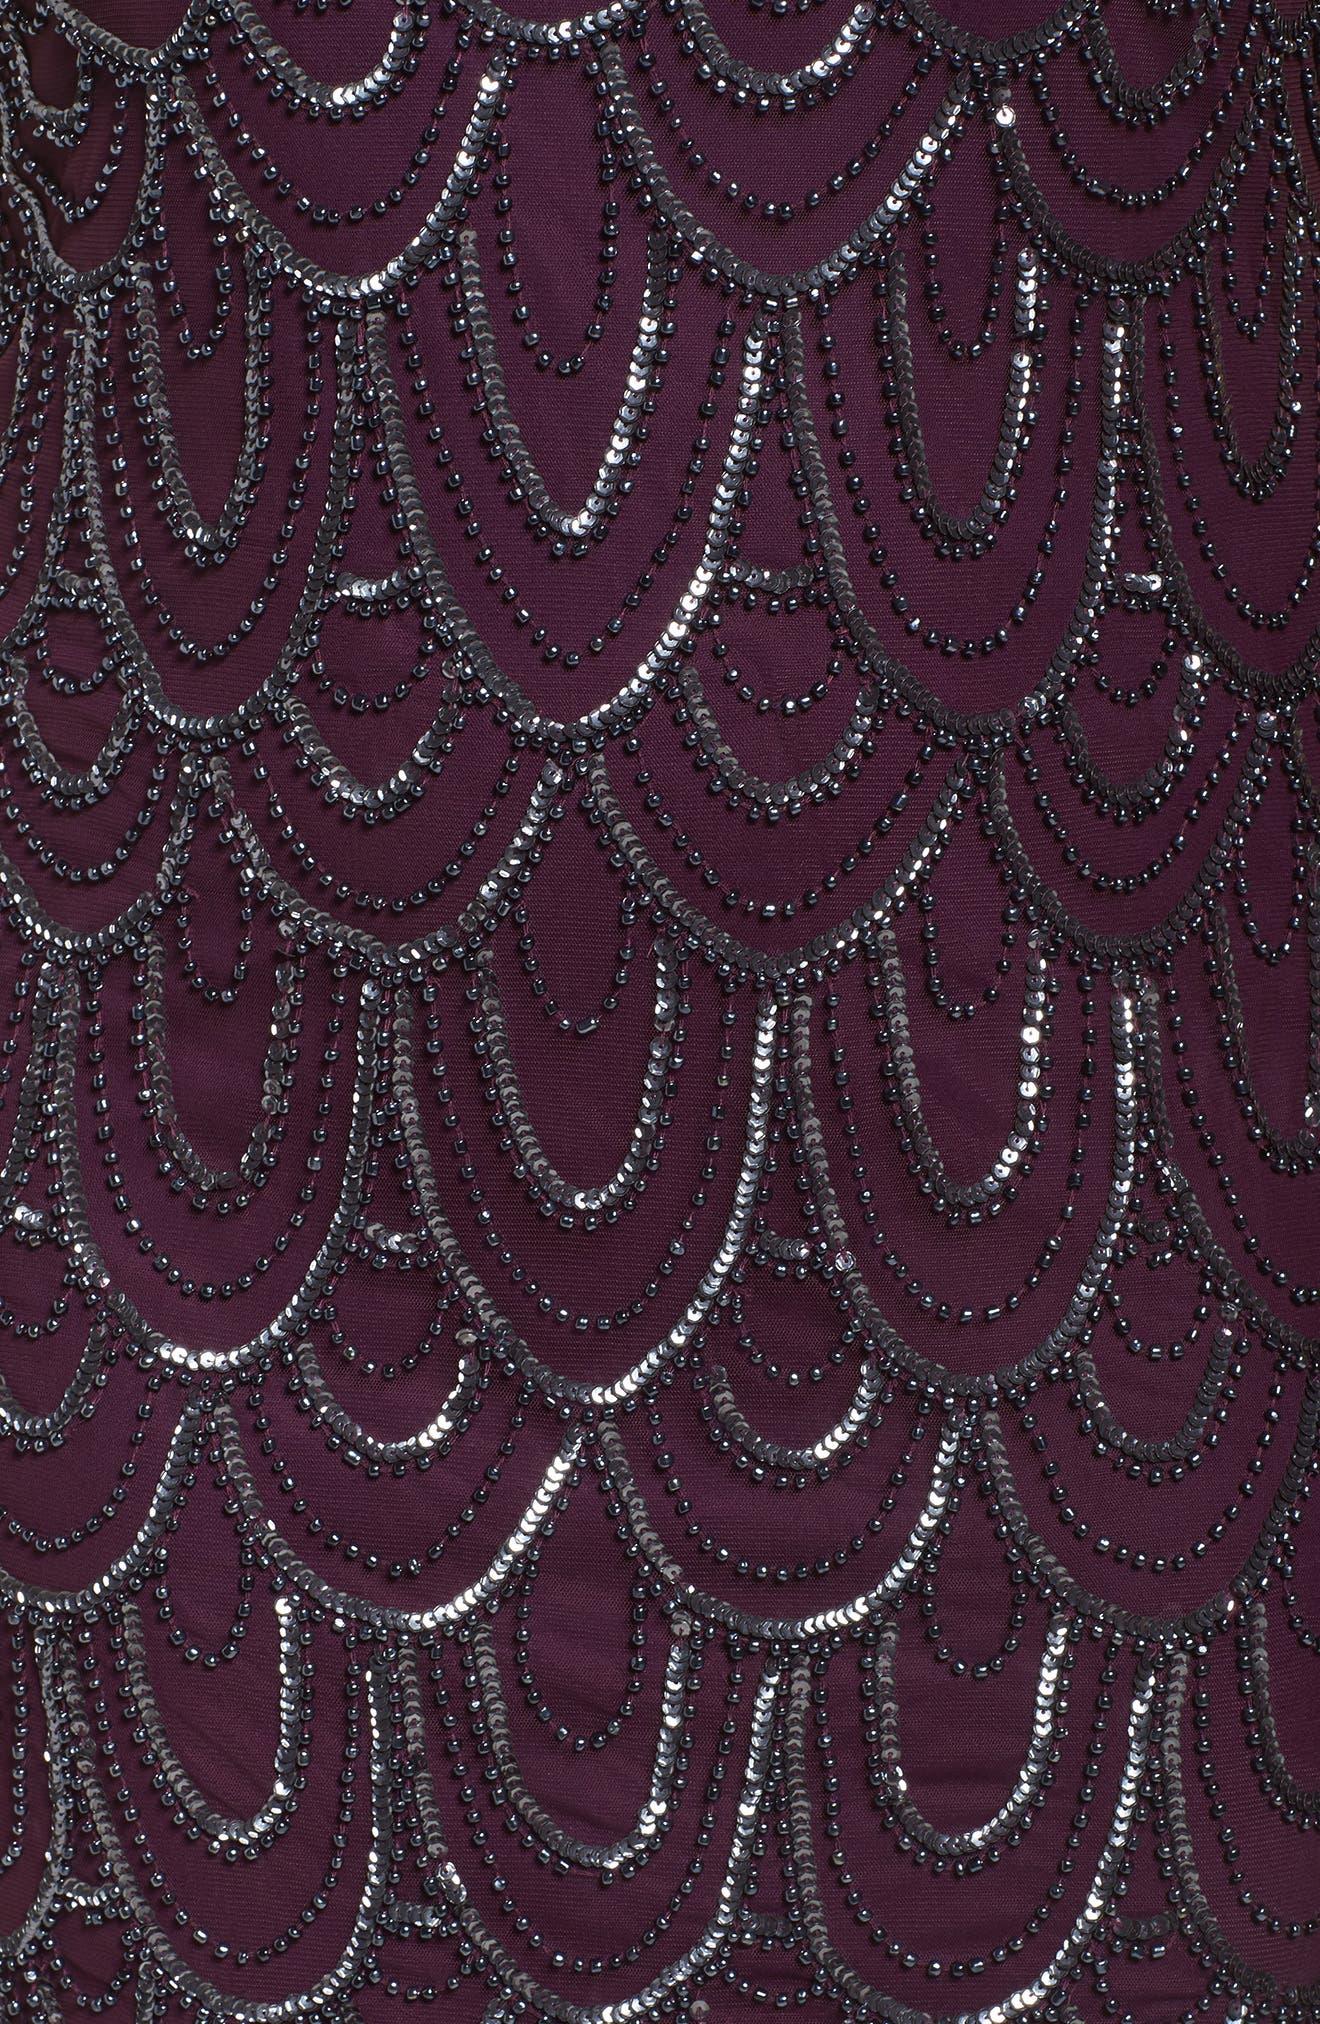 Beaded Sheath Dress,                             Alternate thumbnail 57, color,